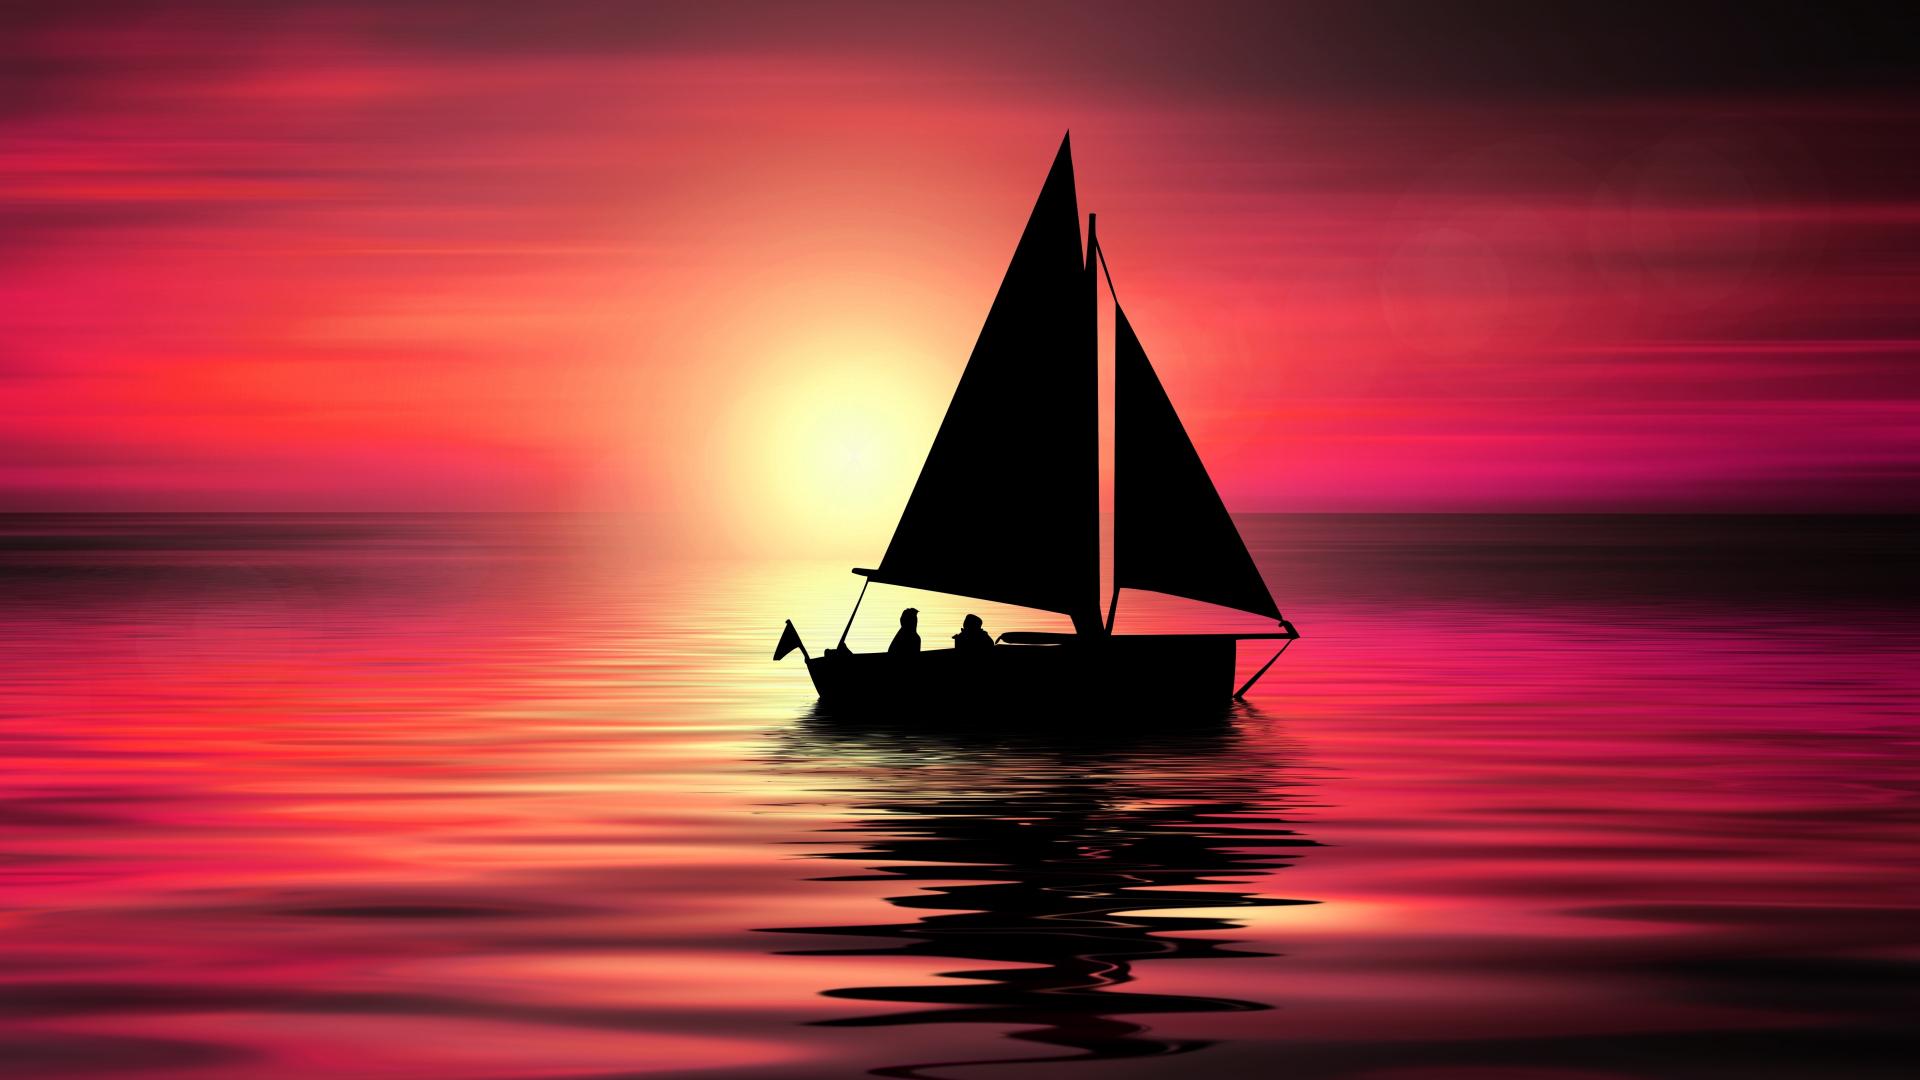 Artwork, sailboat, sunset, silhouette, 1920x1080 wallpaper